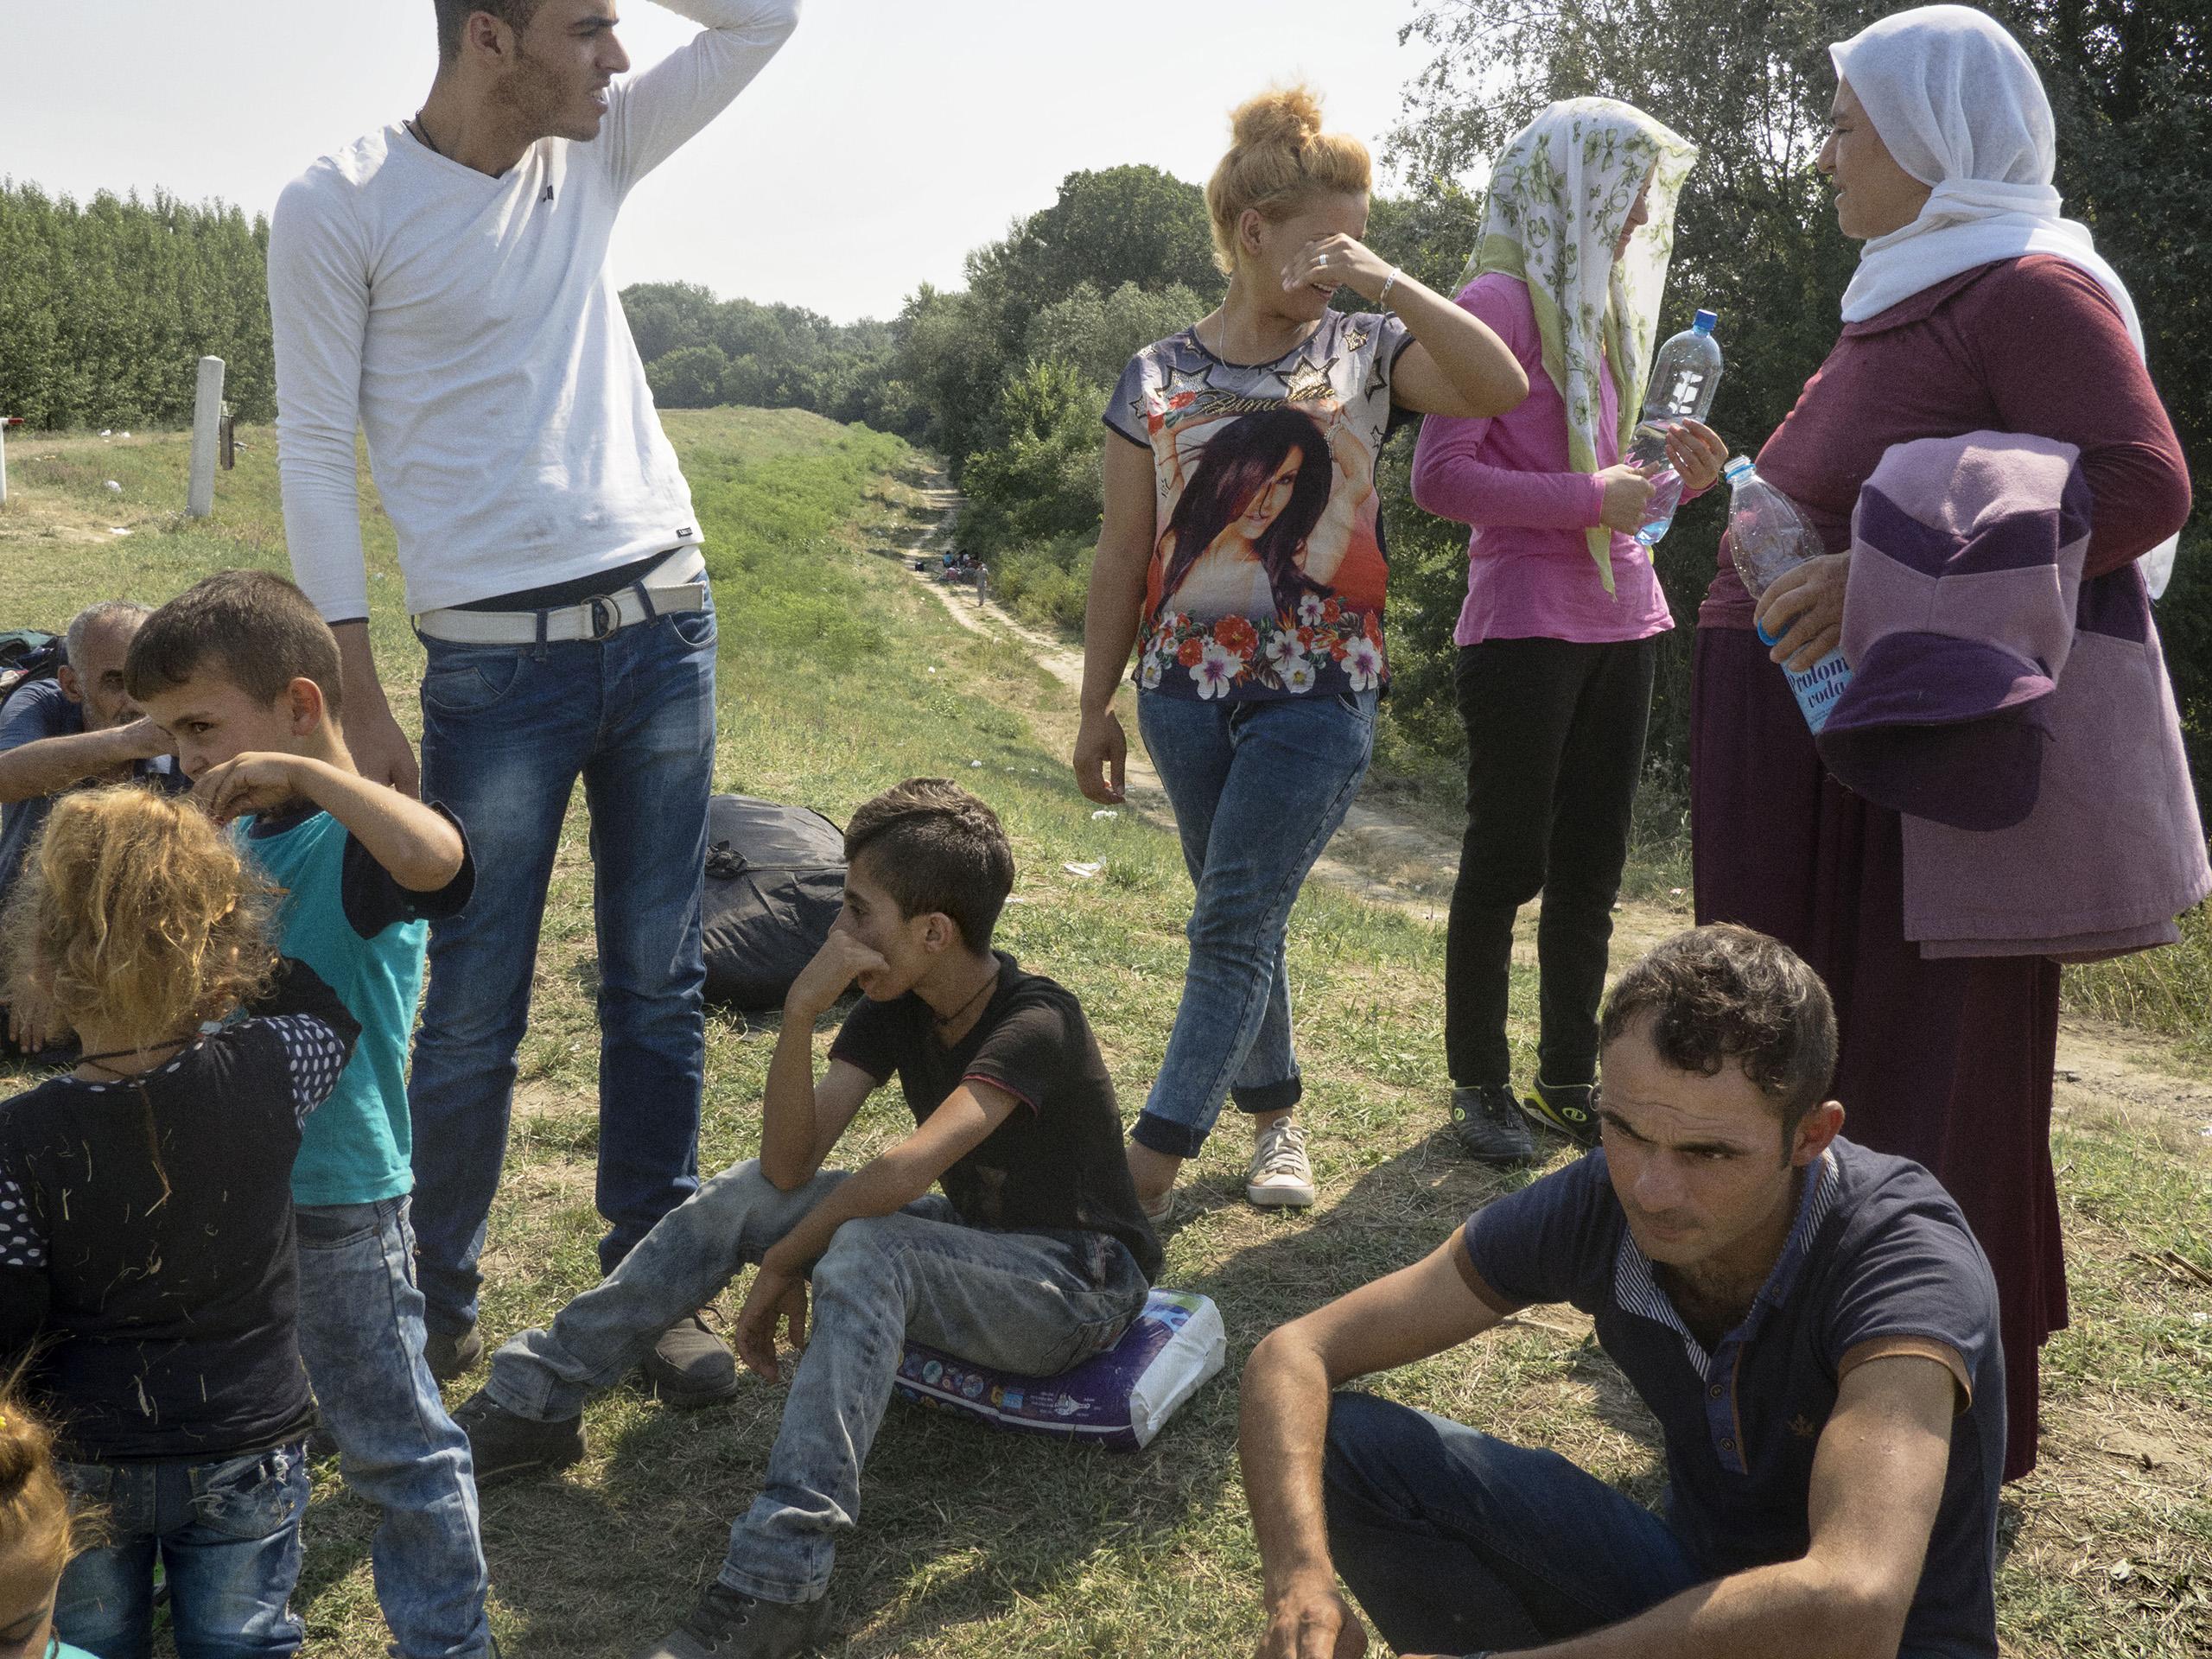 Vasariste, Serbia. August 12, 2015. A Yazidi family from Iraq near the Serbian-Hungarian border.